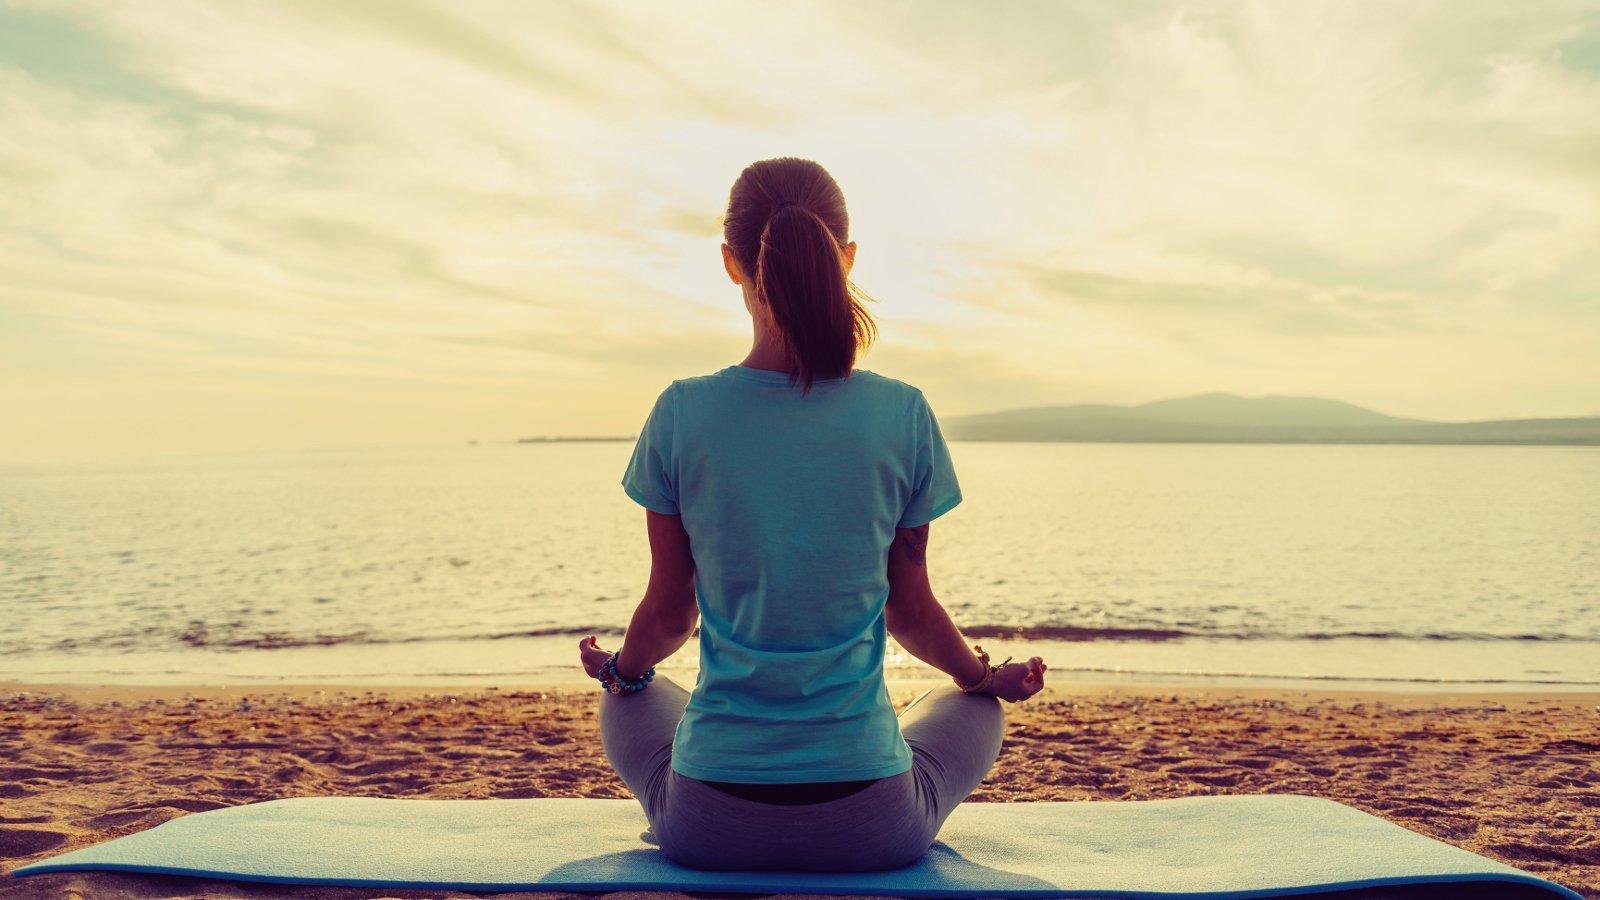 What does meditating feel like? 1